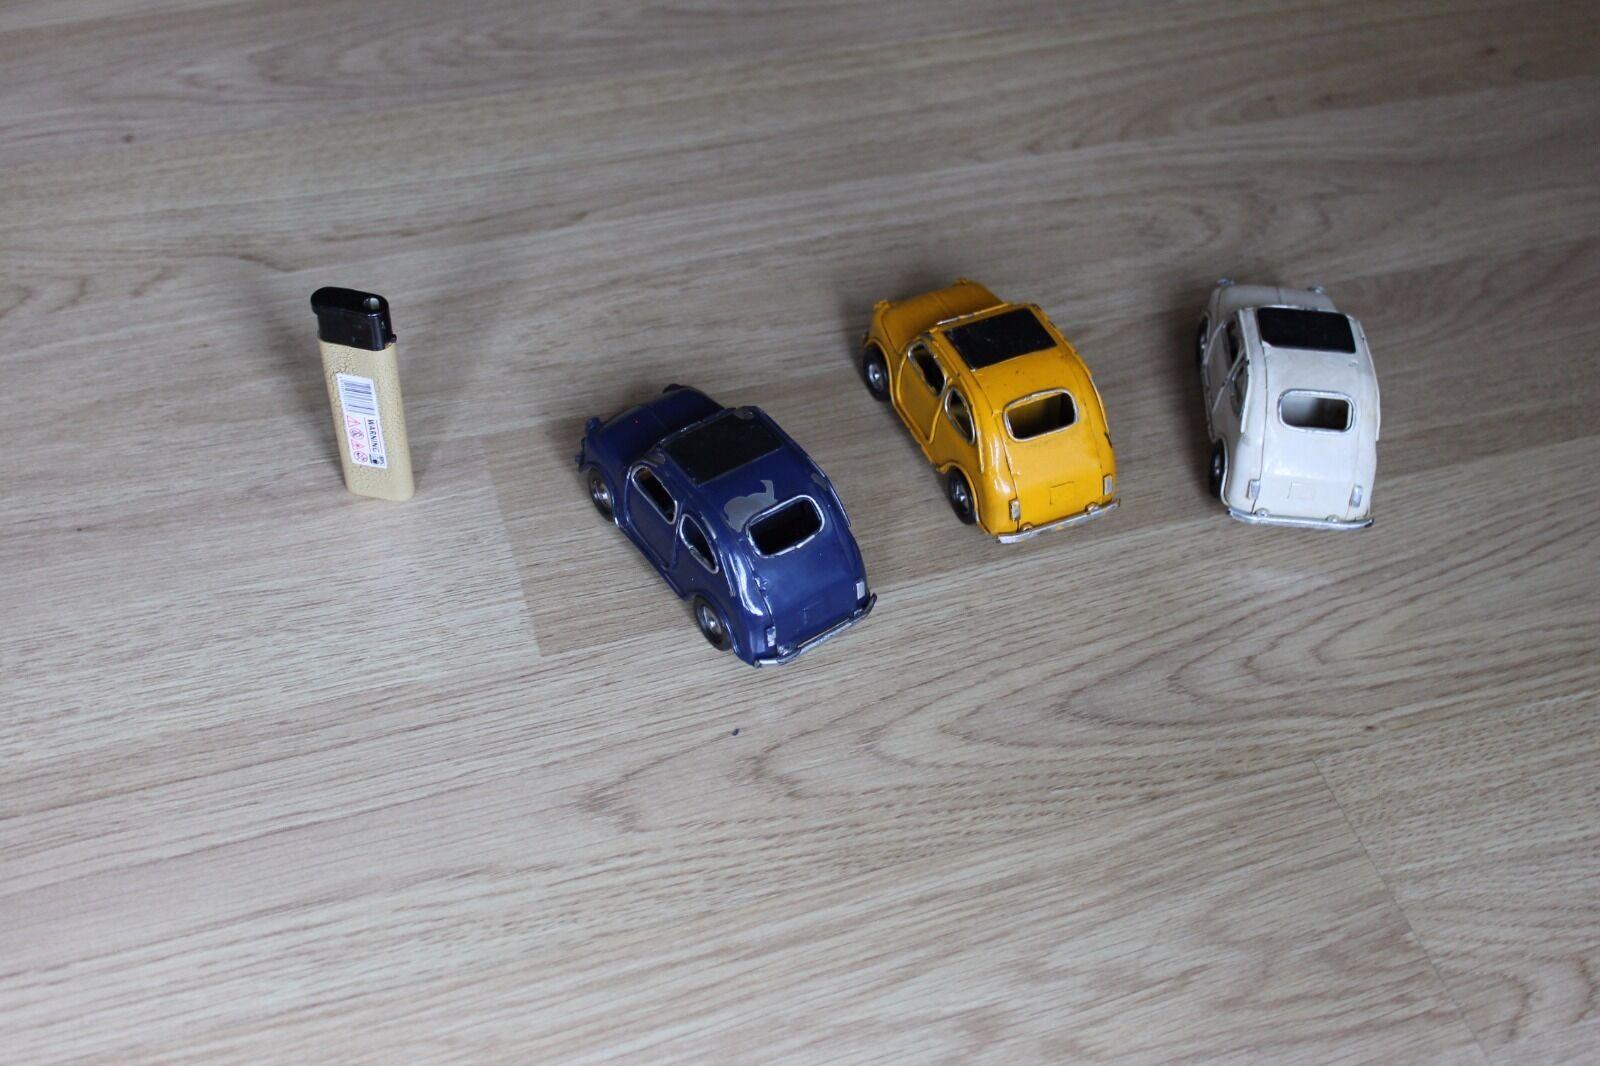 Lot Lot Lot of 3 fiat 500 models 8e94f8